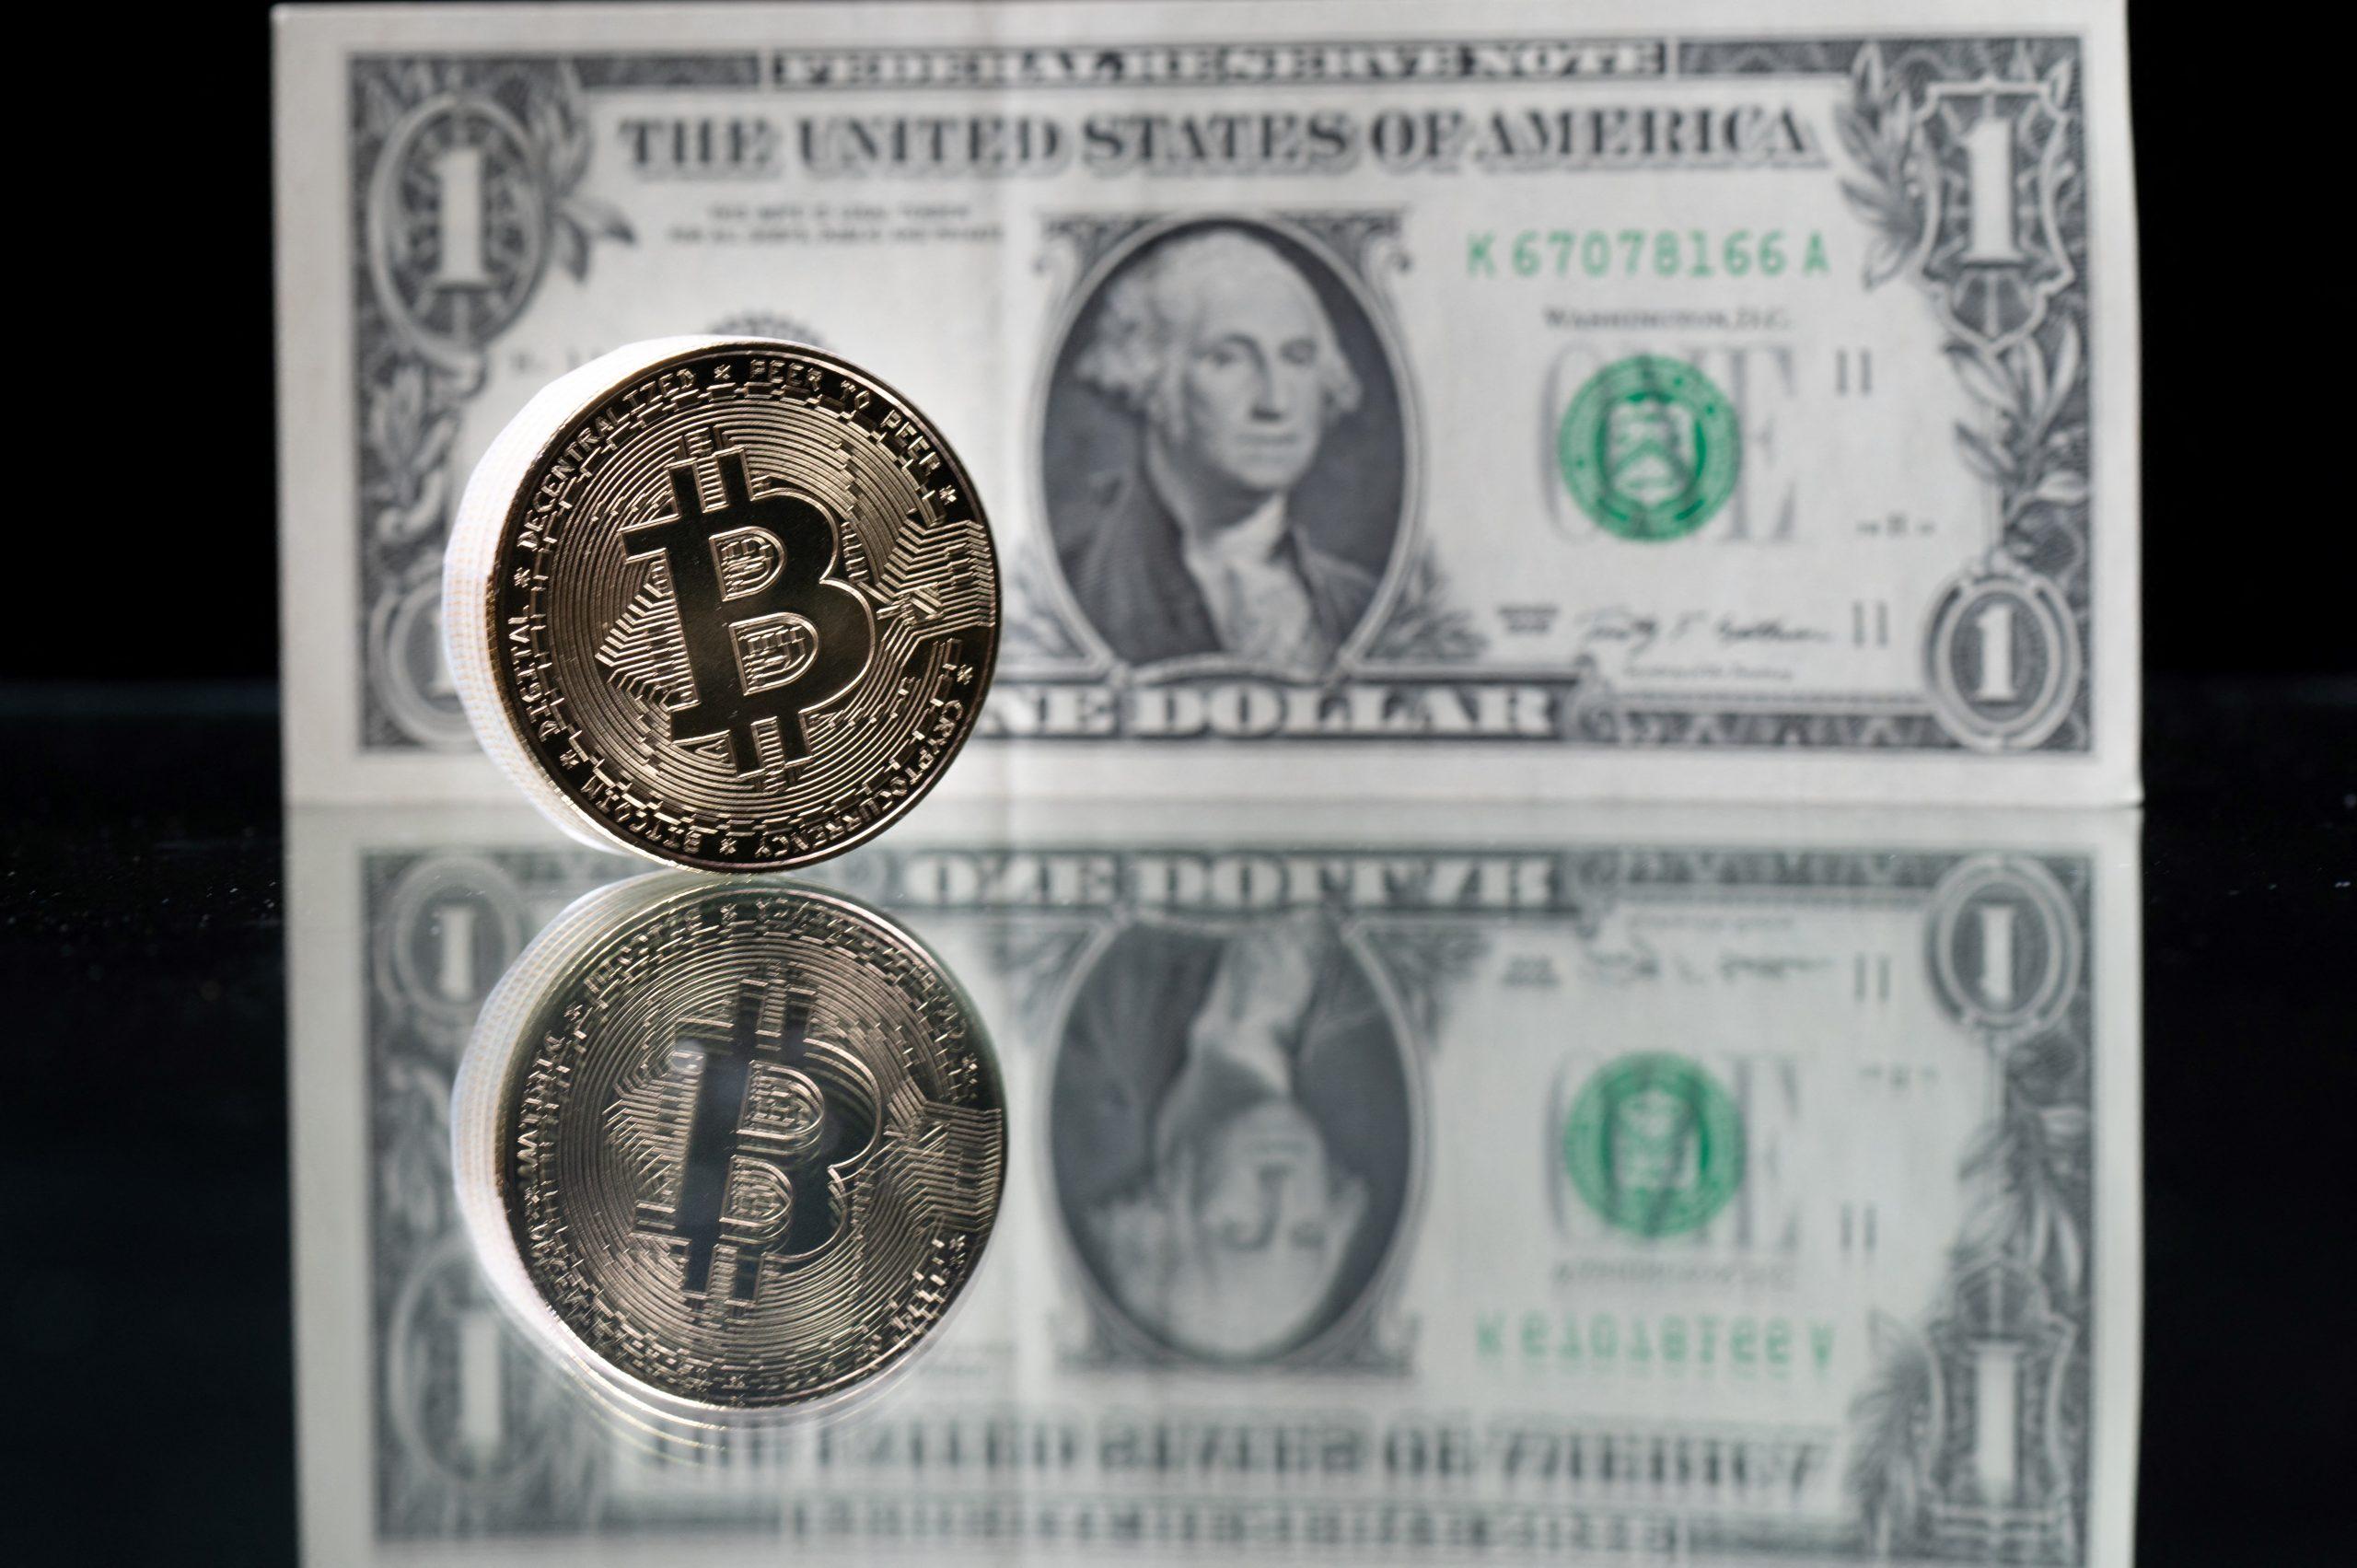 Despite crash, crypto surge threatens financial system